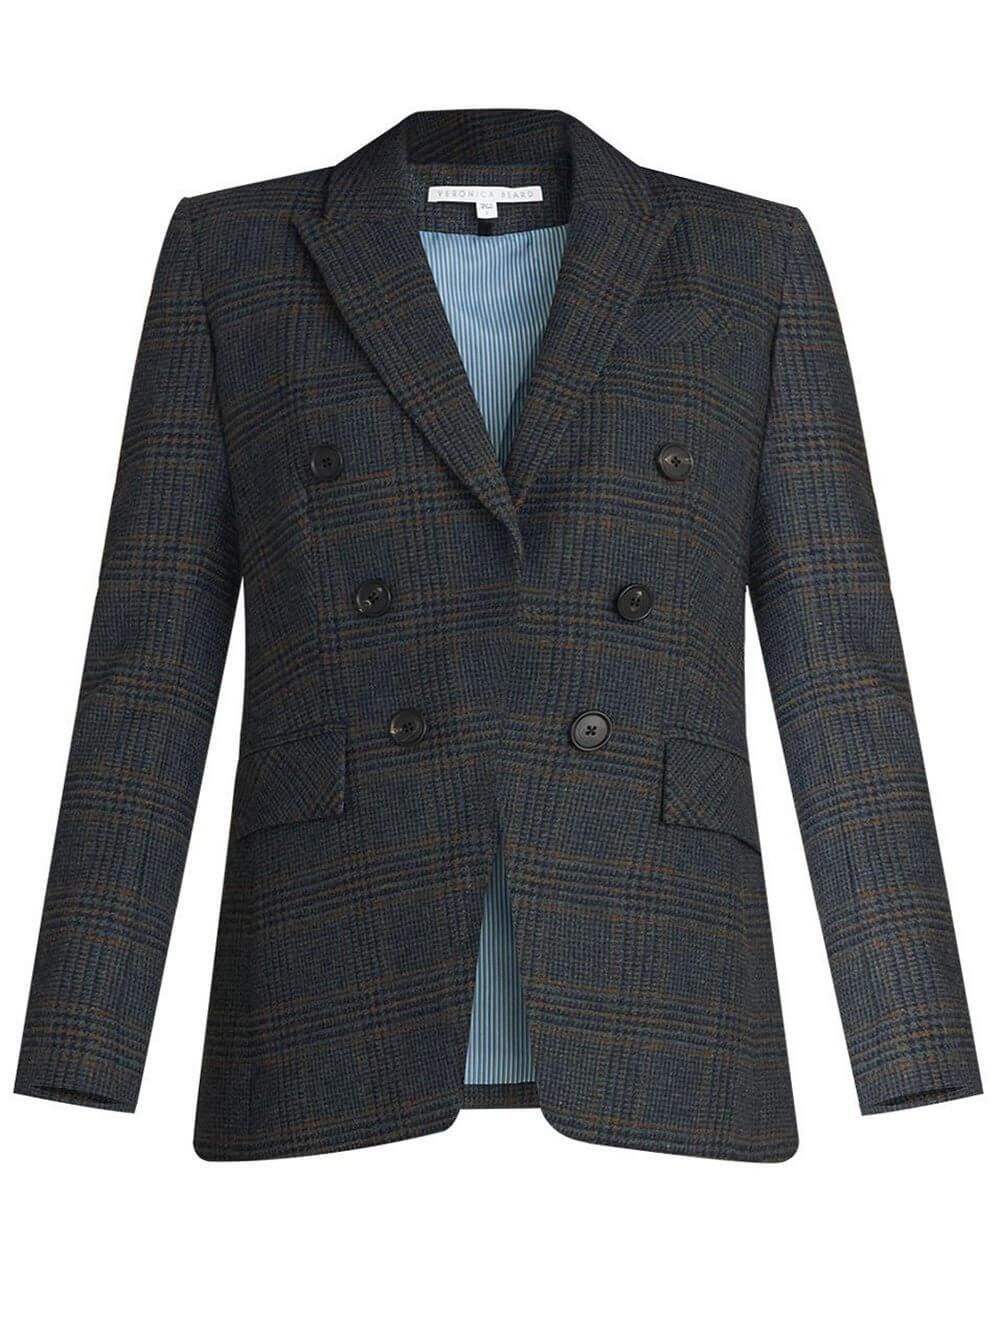 Yareli Dickey Jacket Item # 2009PL0501665